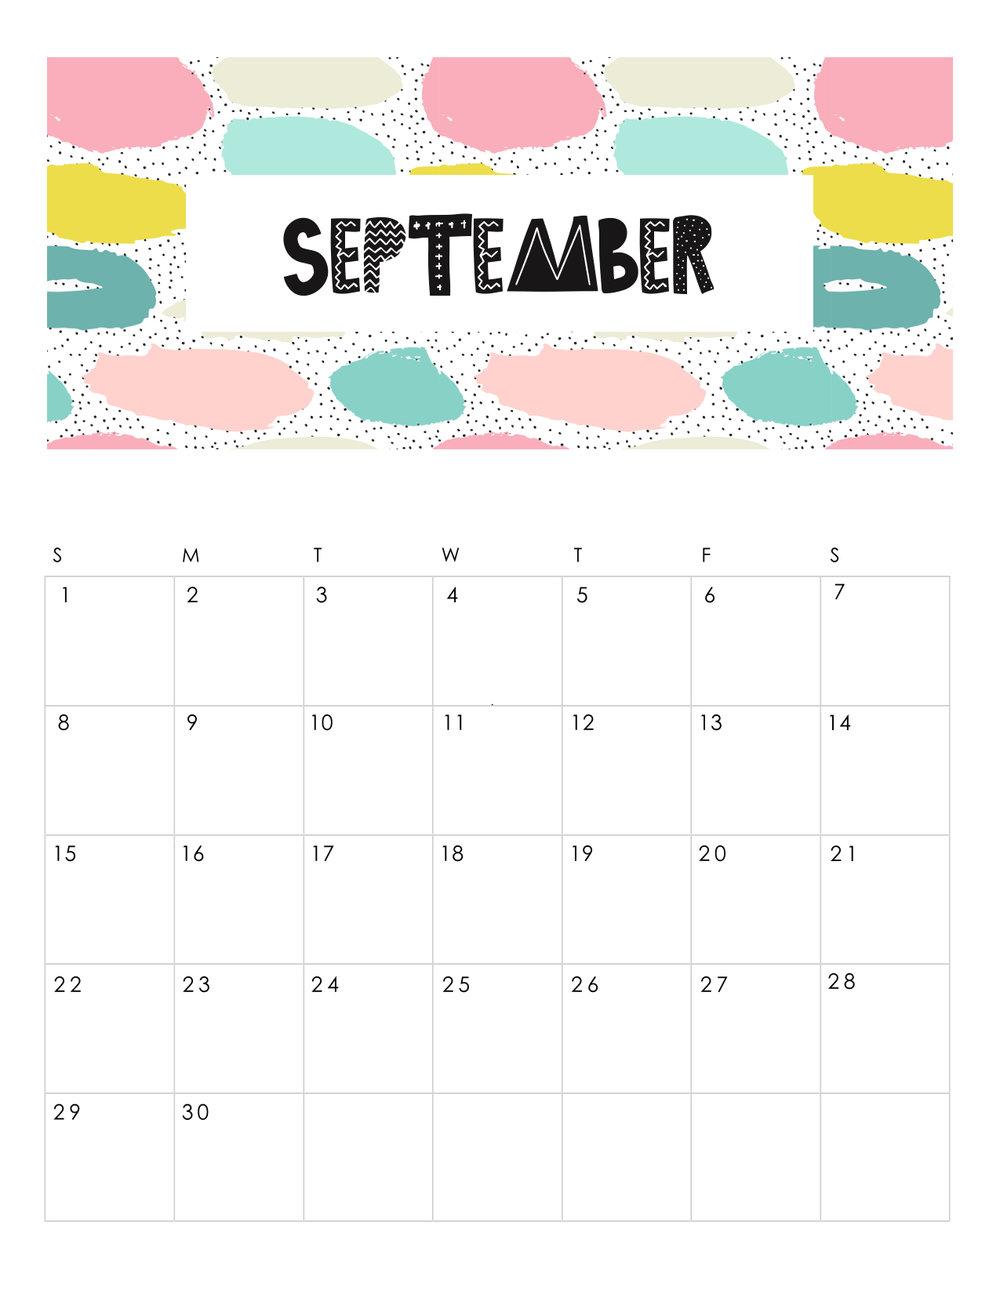 free-printable-abstract-patterned-calendar-2019-SEPTEMBER.JPG